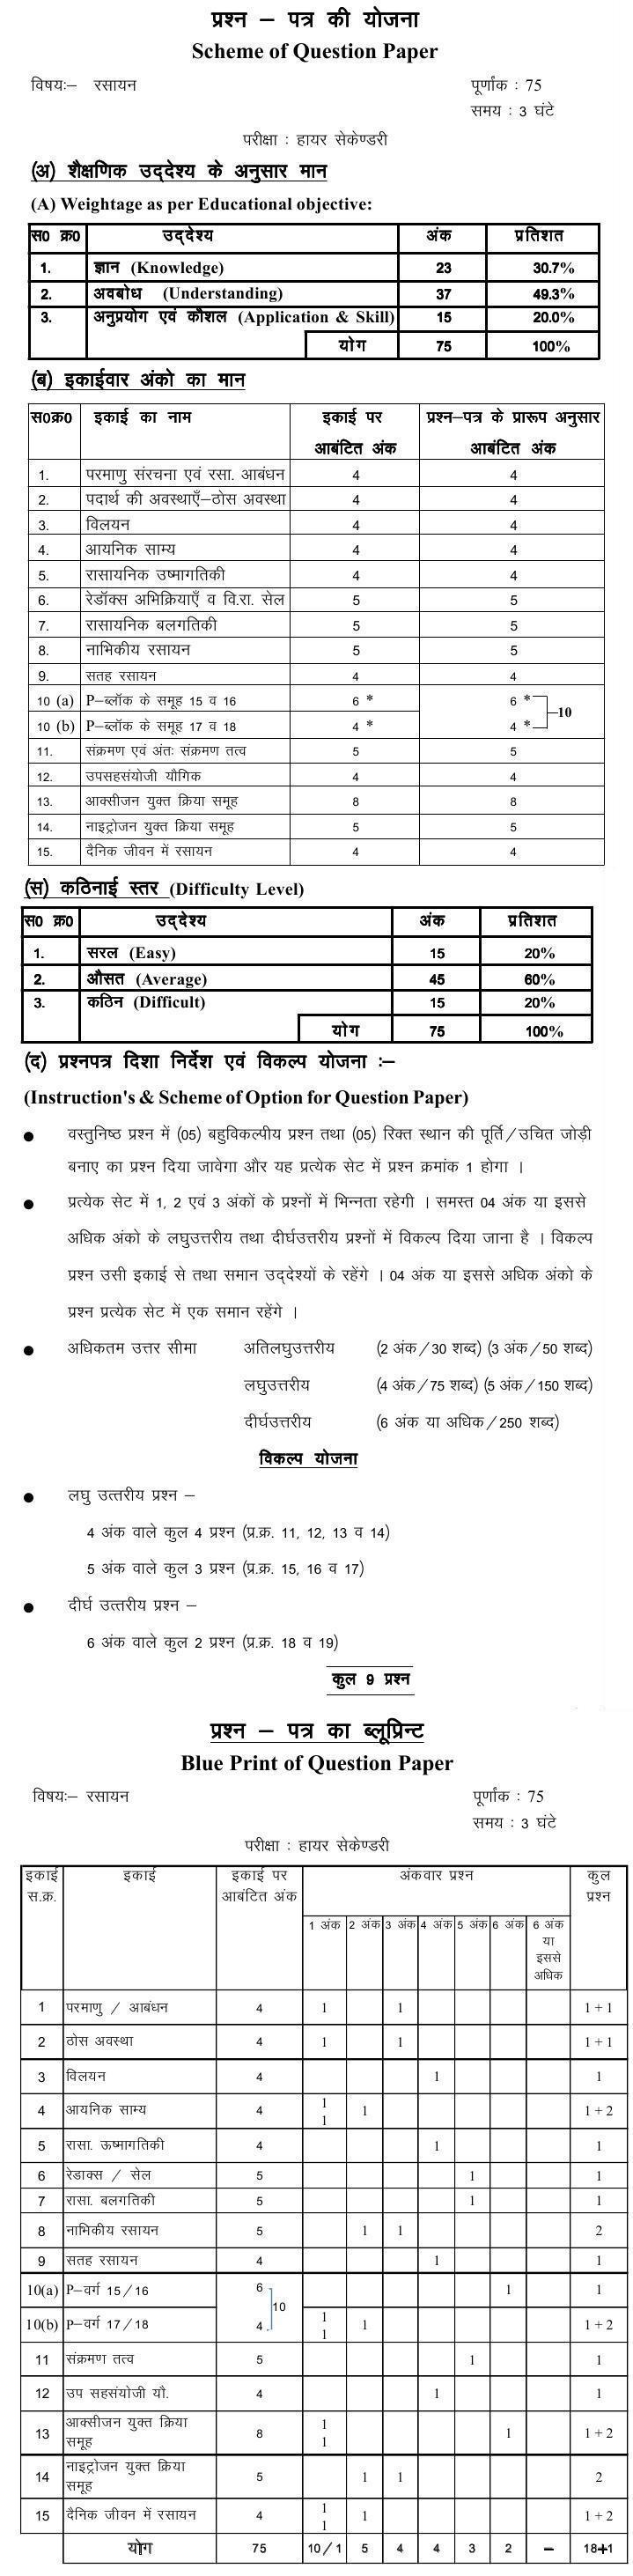 Chattisgarh Board Class 12 Scheme and Blue Print of Chemistry